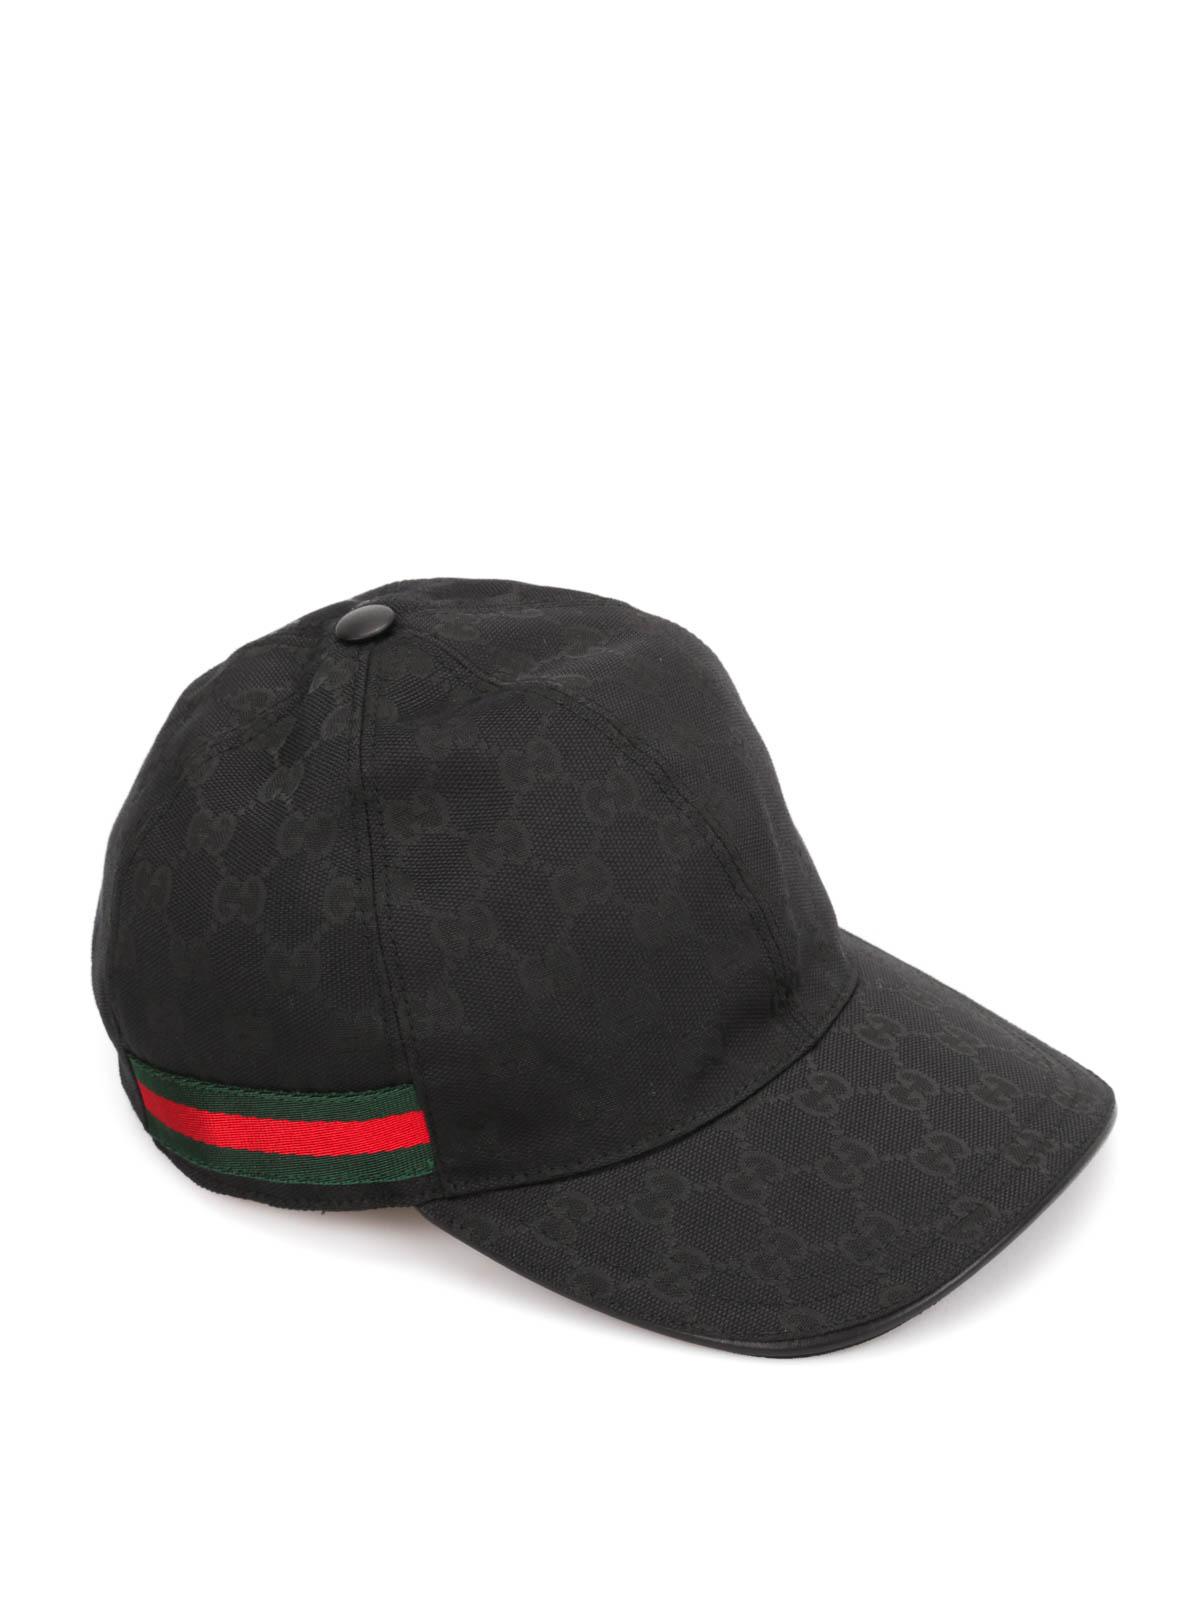 Loop And Hook >> Gucci - GG canvas baseball hat - hats & caps - 200035 FFKPG 1060